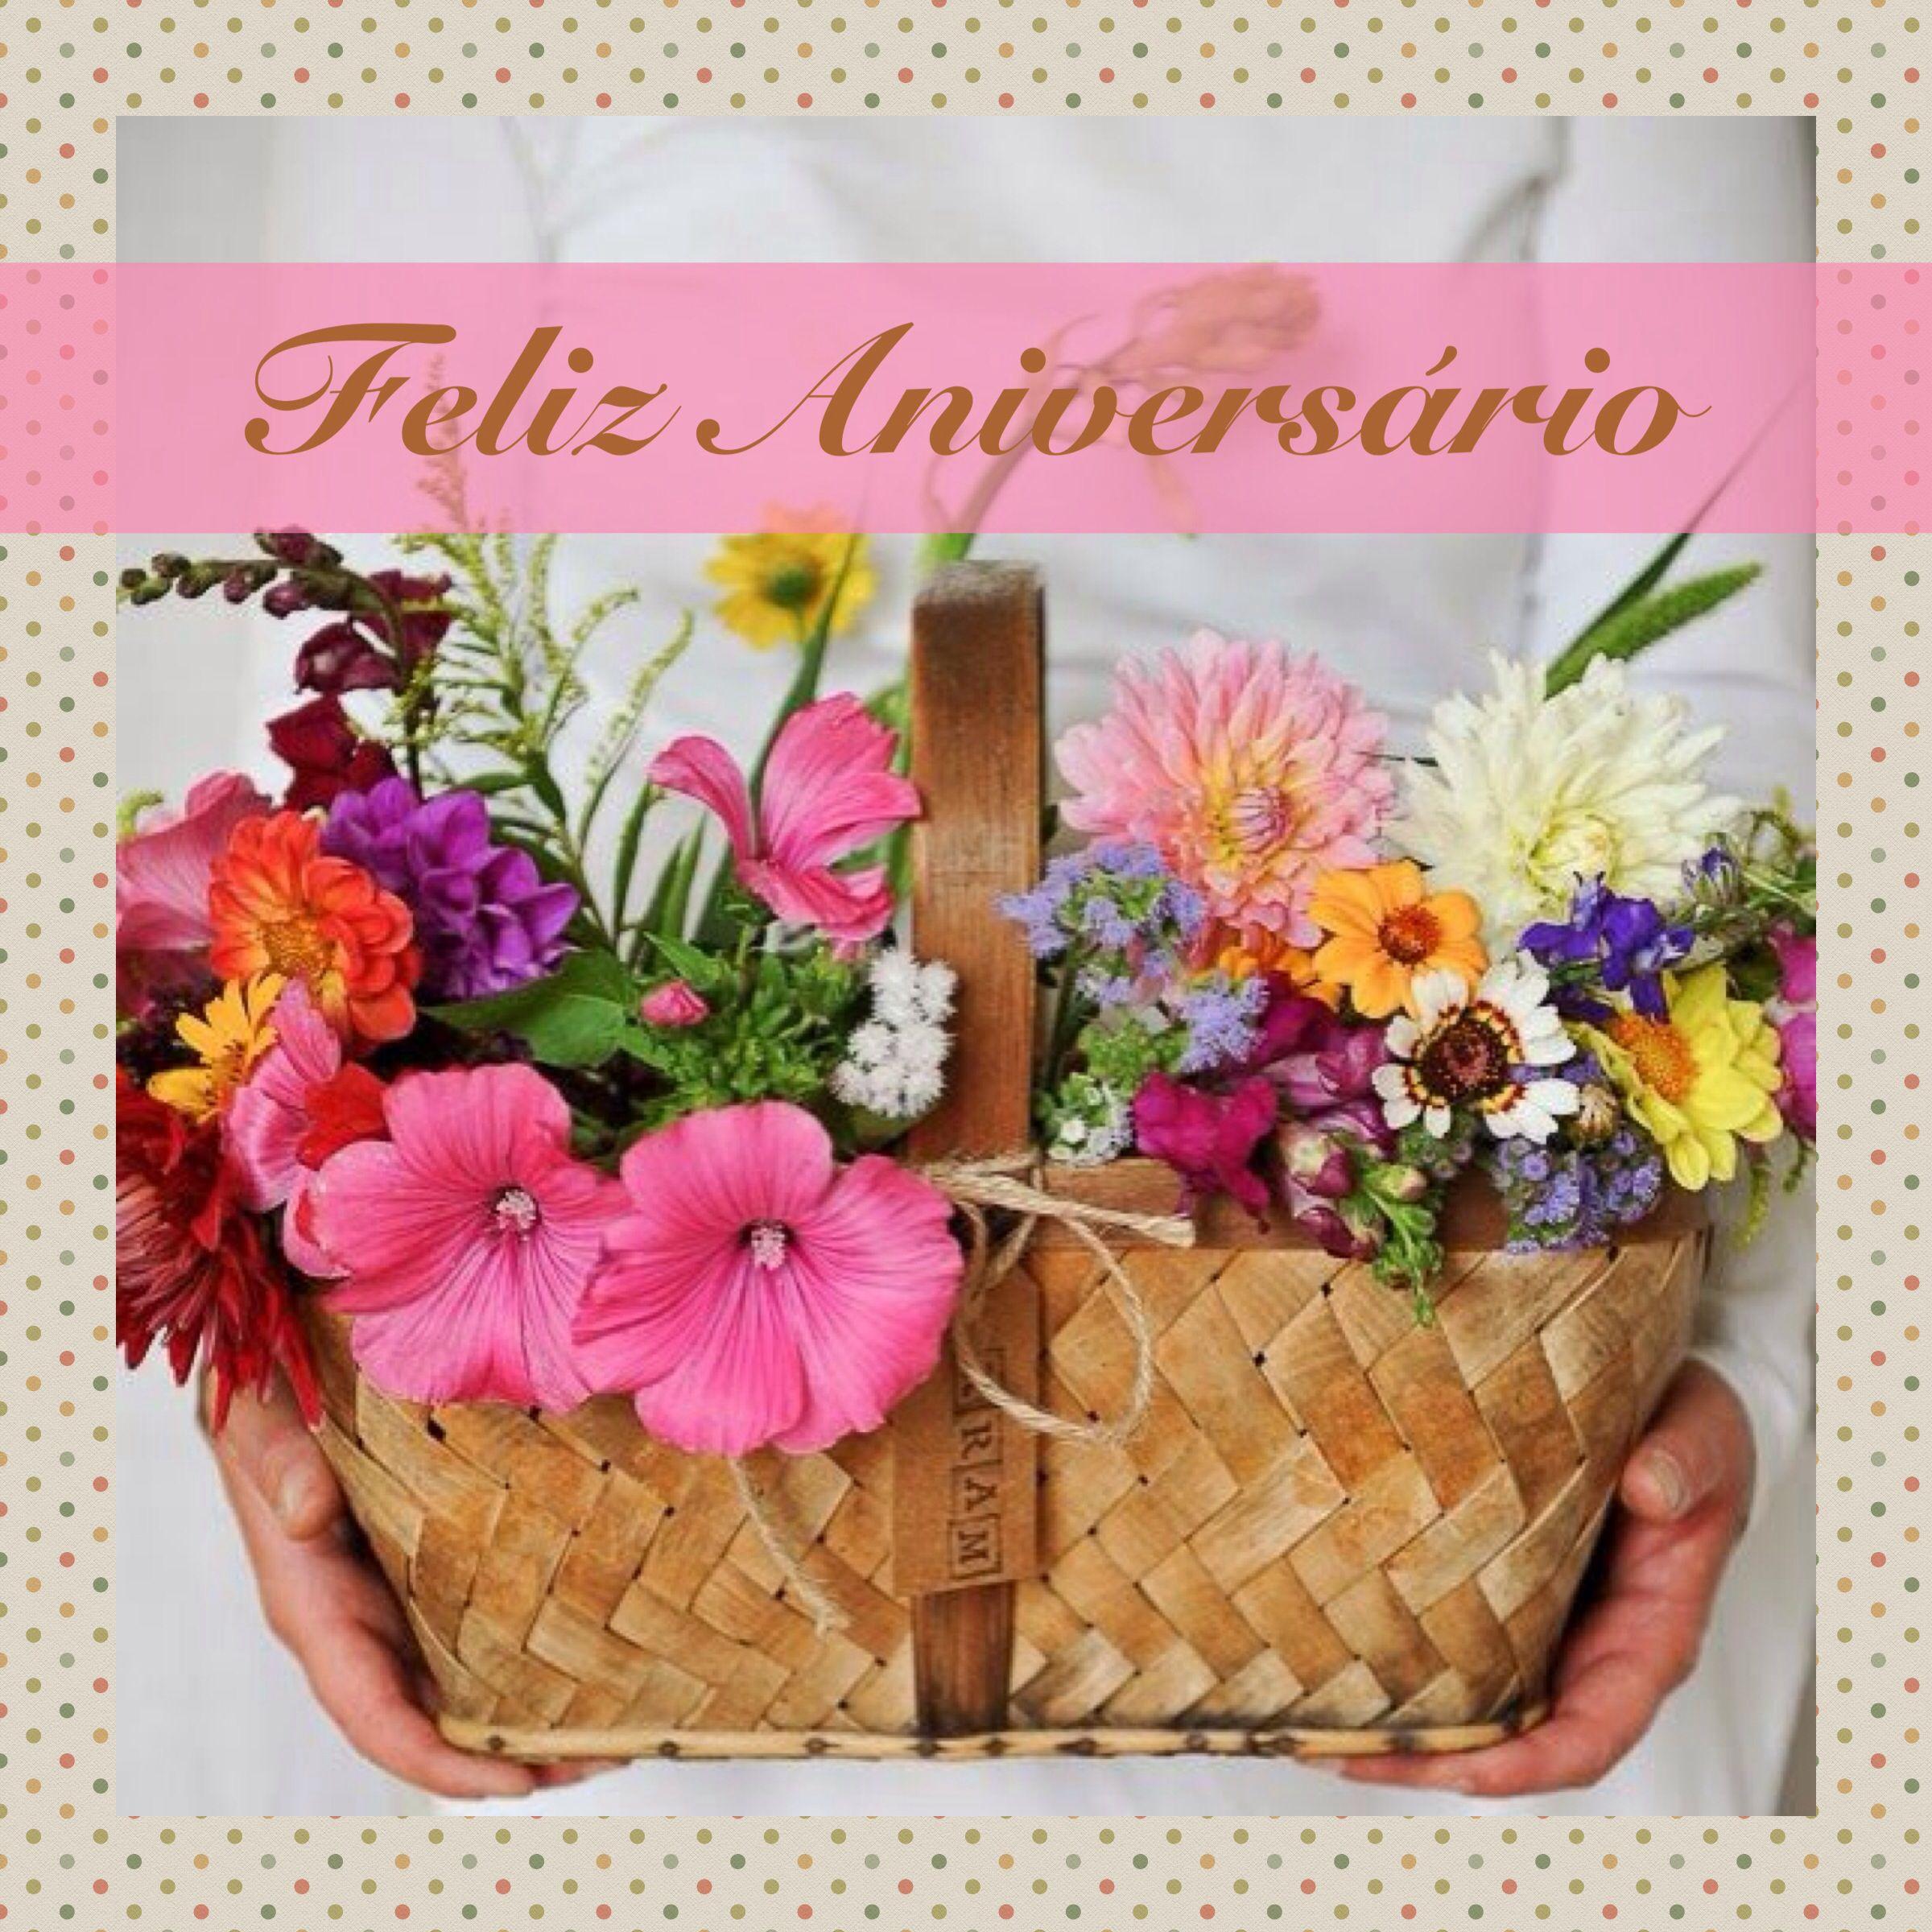 Feliz aniversrio feliz aniversrio pinterest birthday msg and simple spring and summer flowers in bloom izmirmasajfo